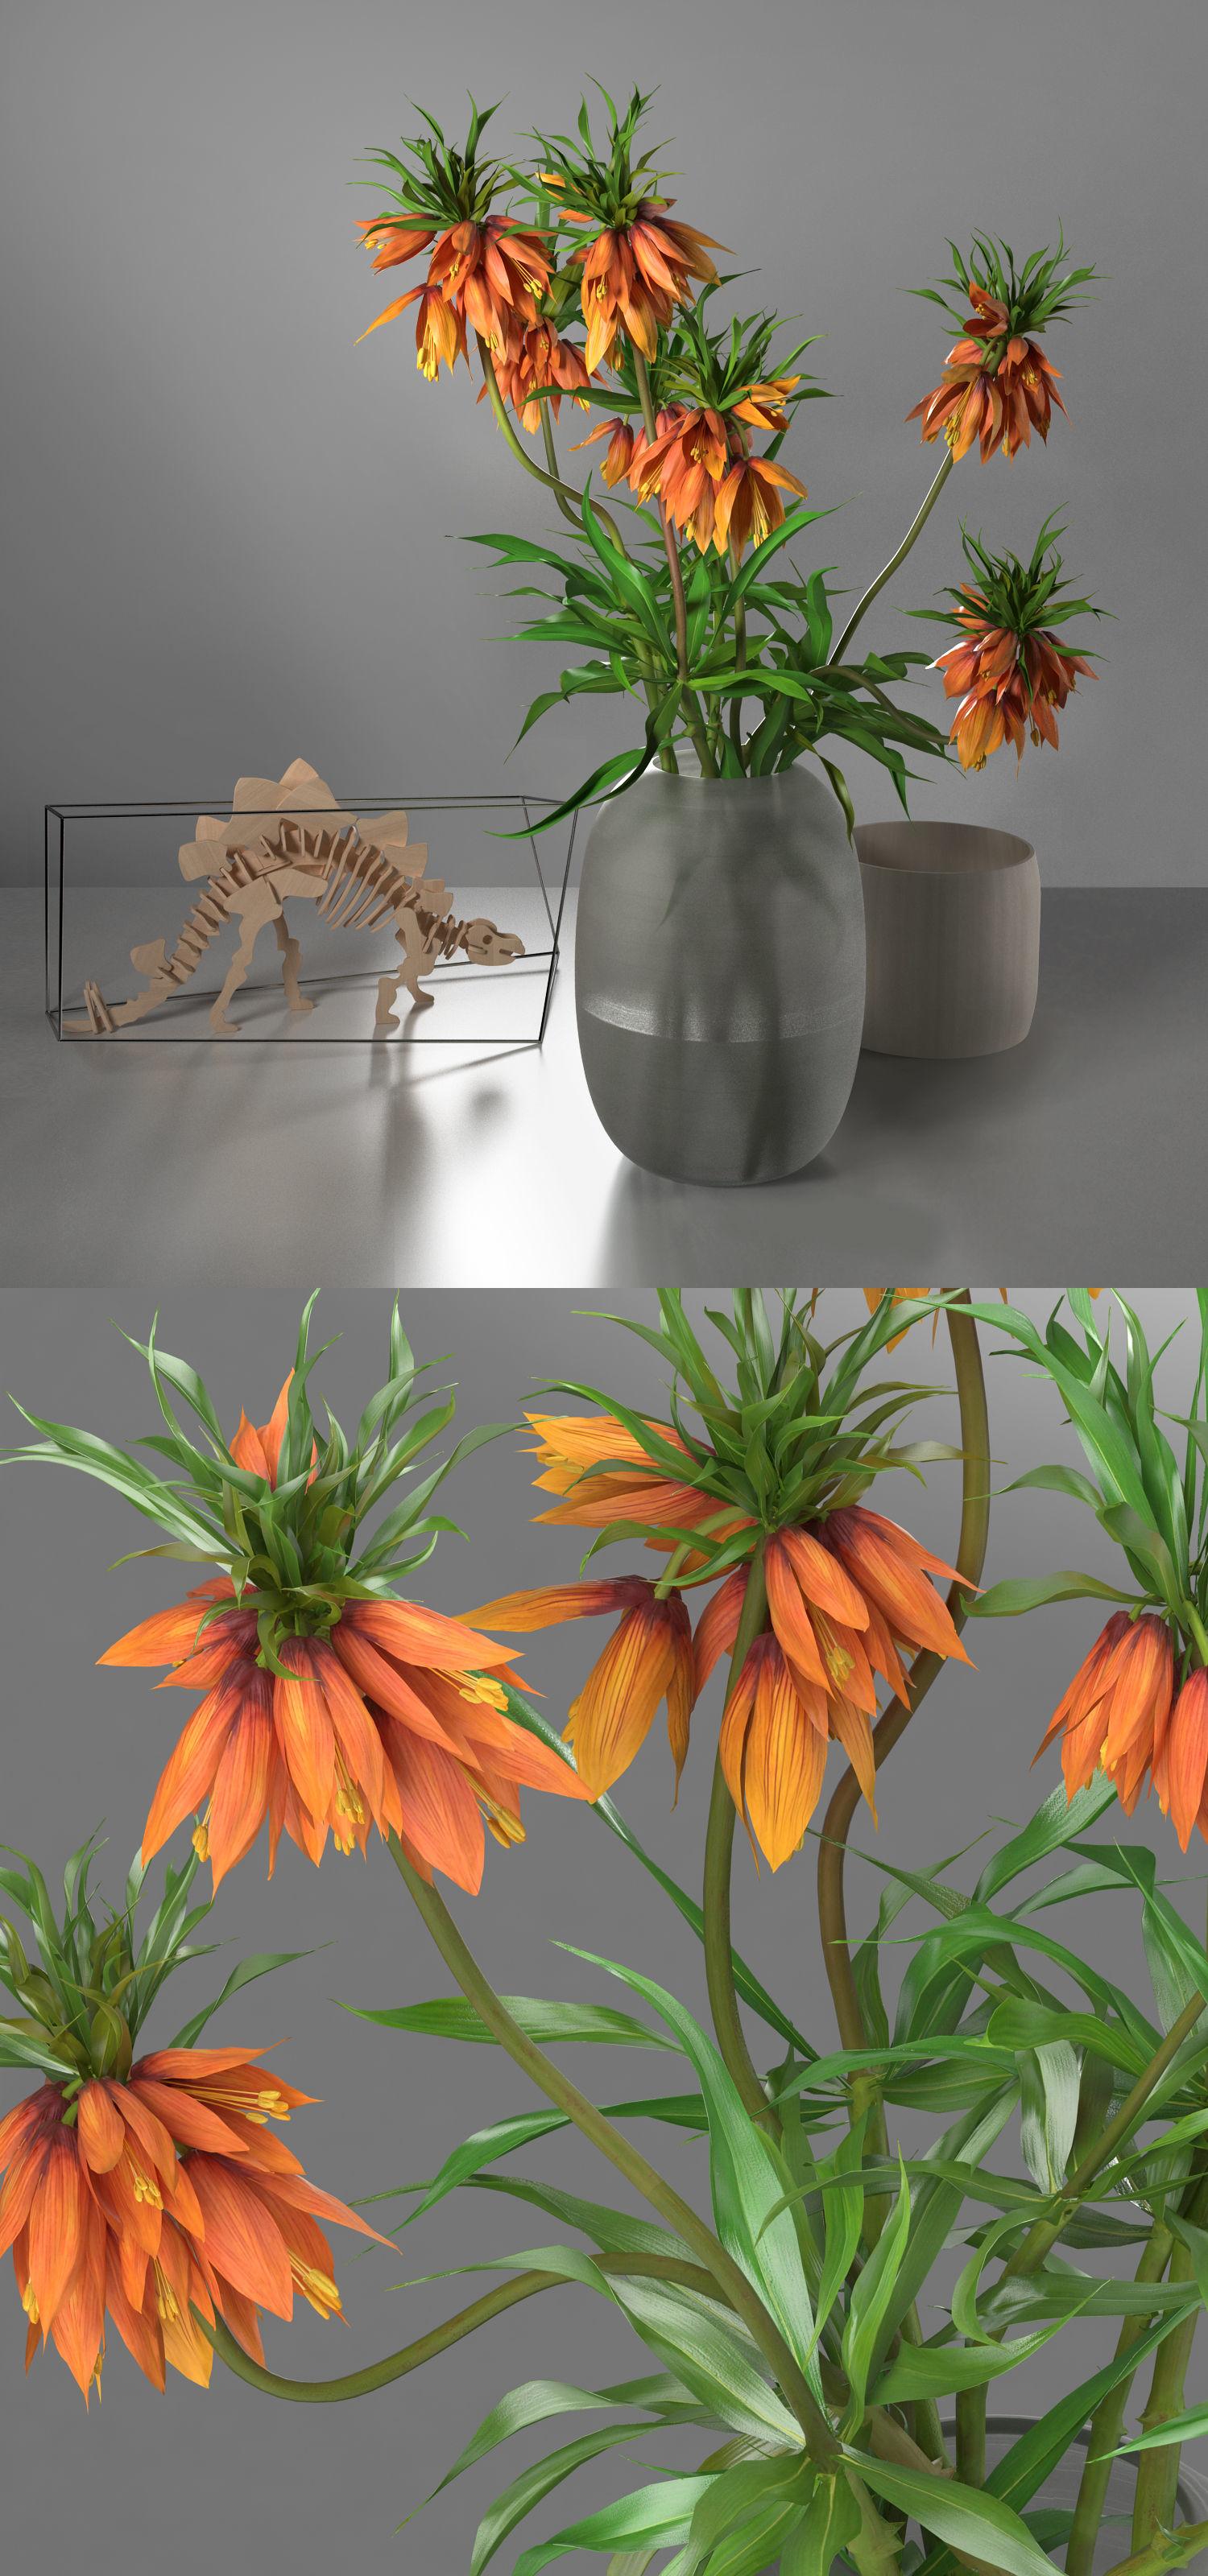 3D wooden dinosaur decoration set model